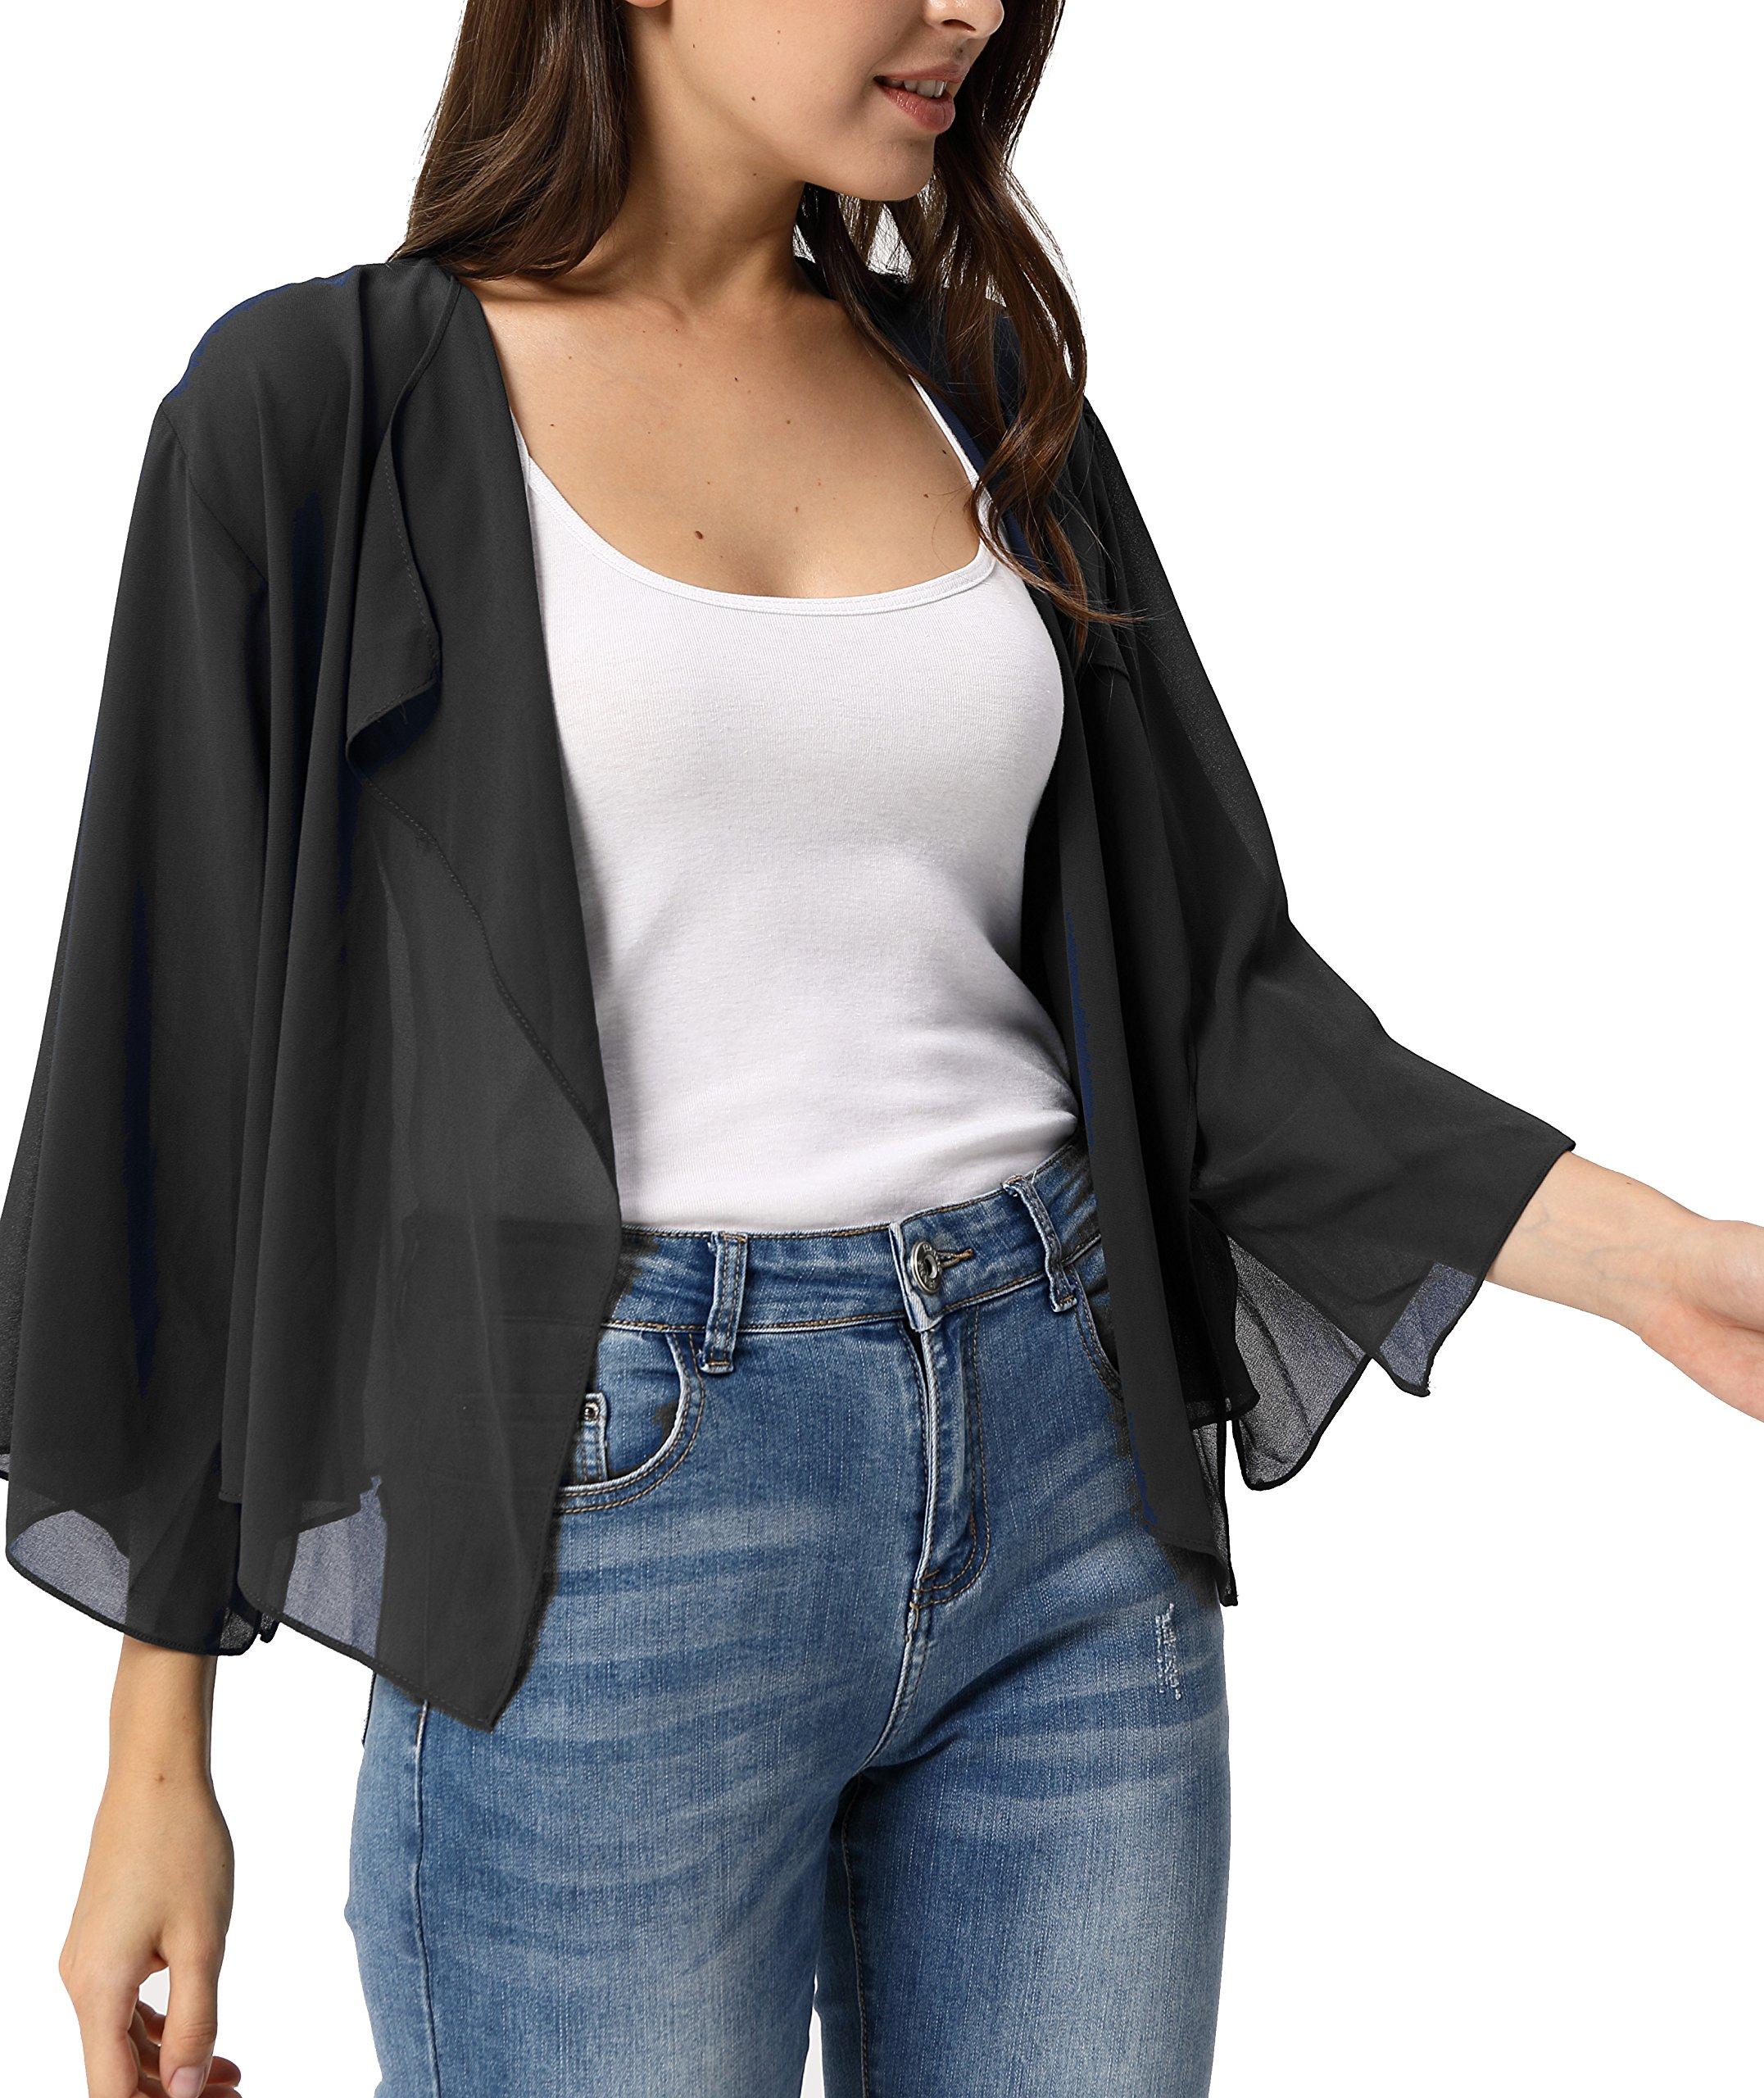 Kate Kasin Shrug Drape Open Front 3/4 Sleeve Bolero Cardigan KK913